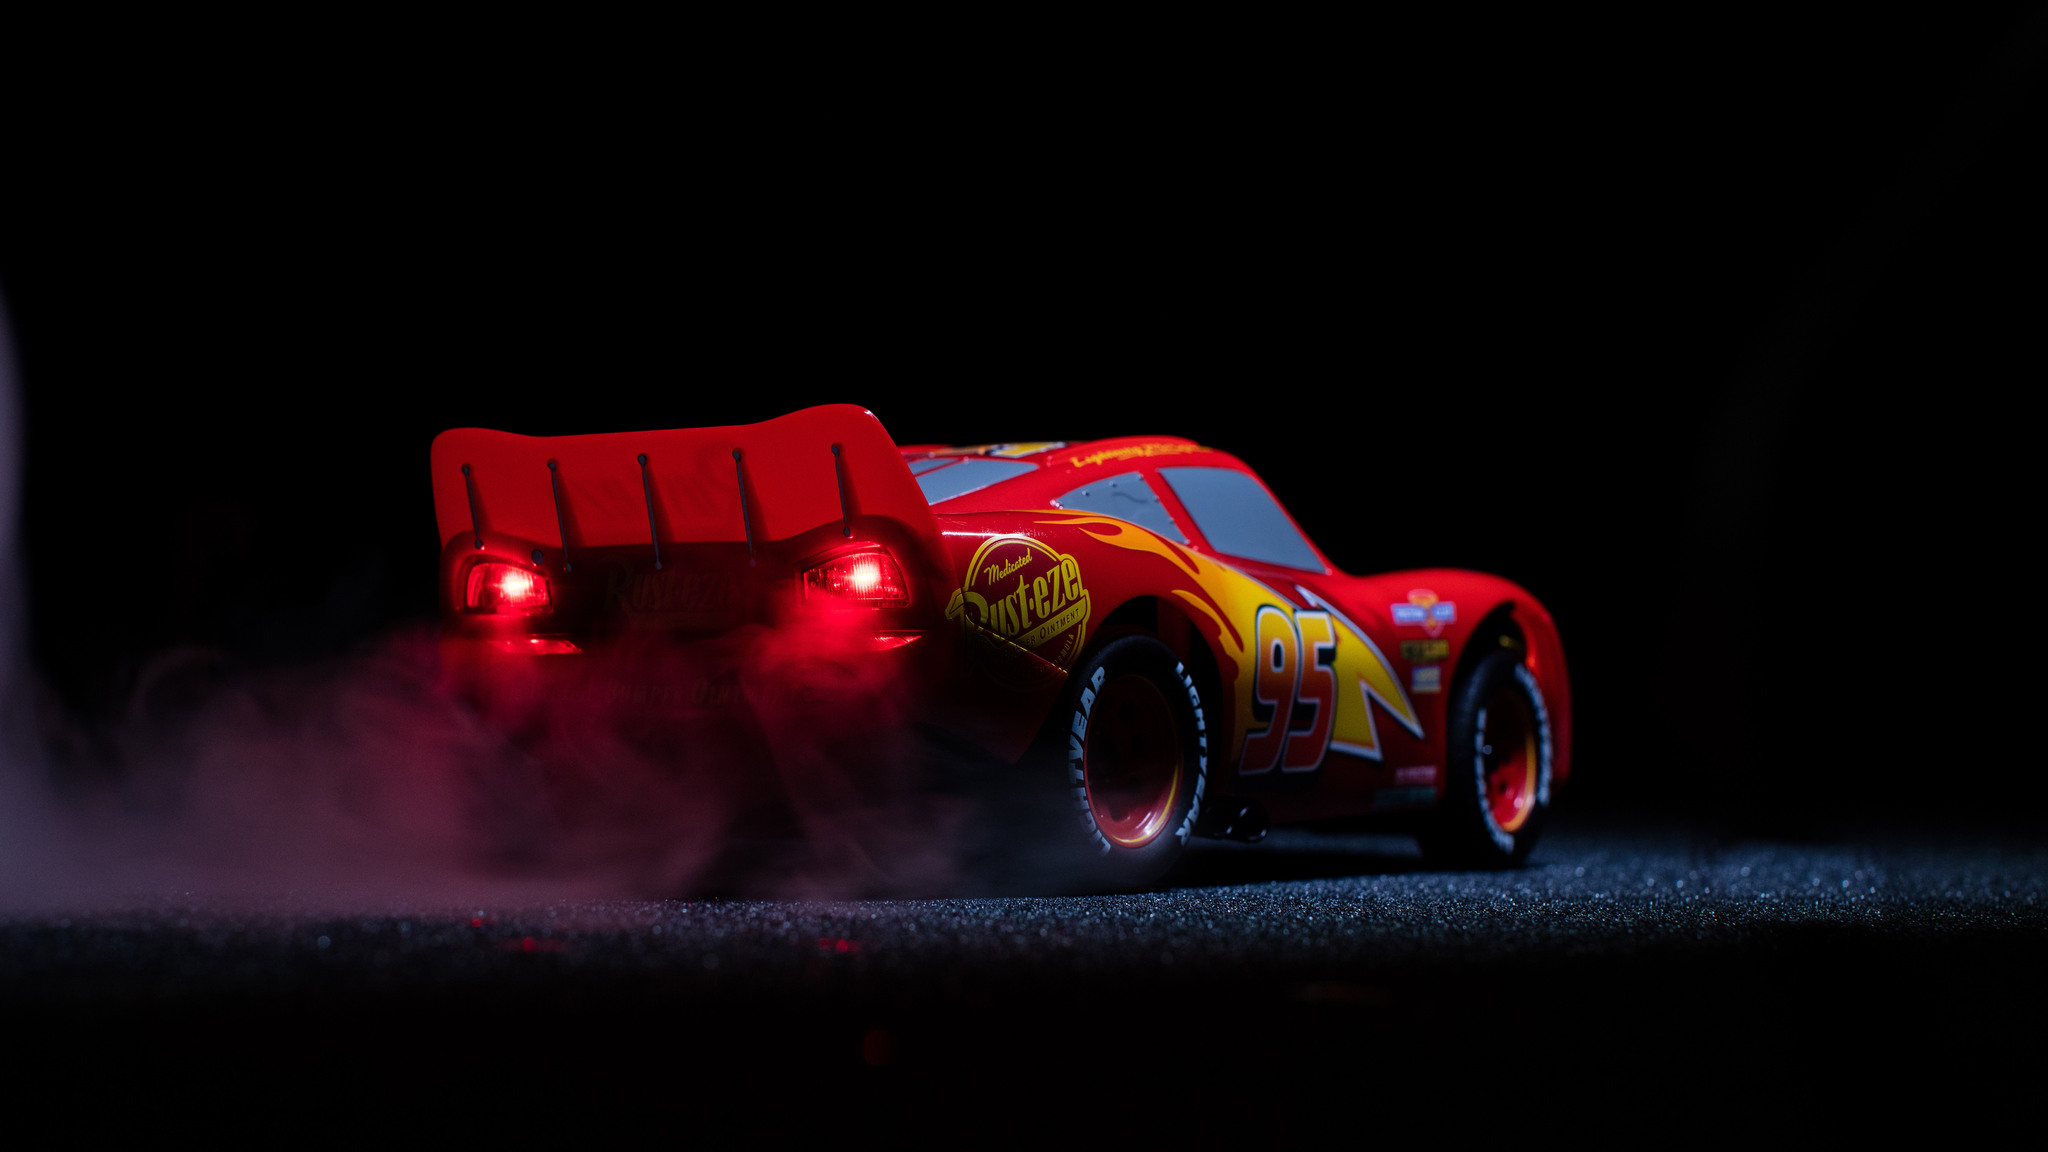 2048x1152 Lightning McQueen Cars 3 Pixar Disney 4k ...